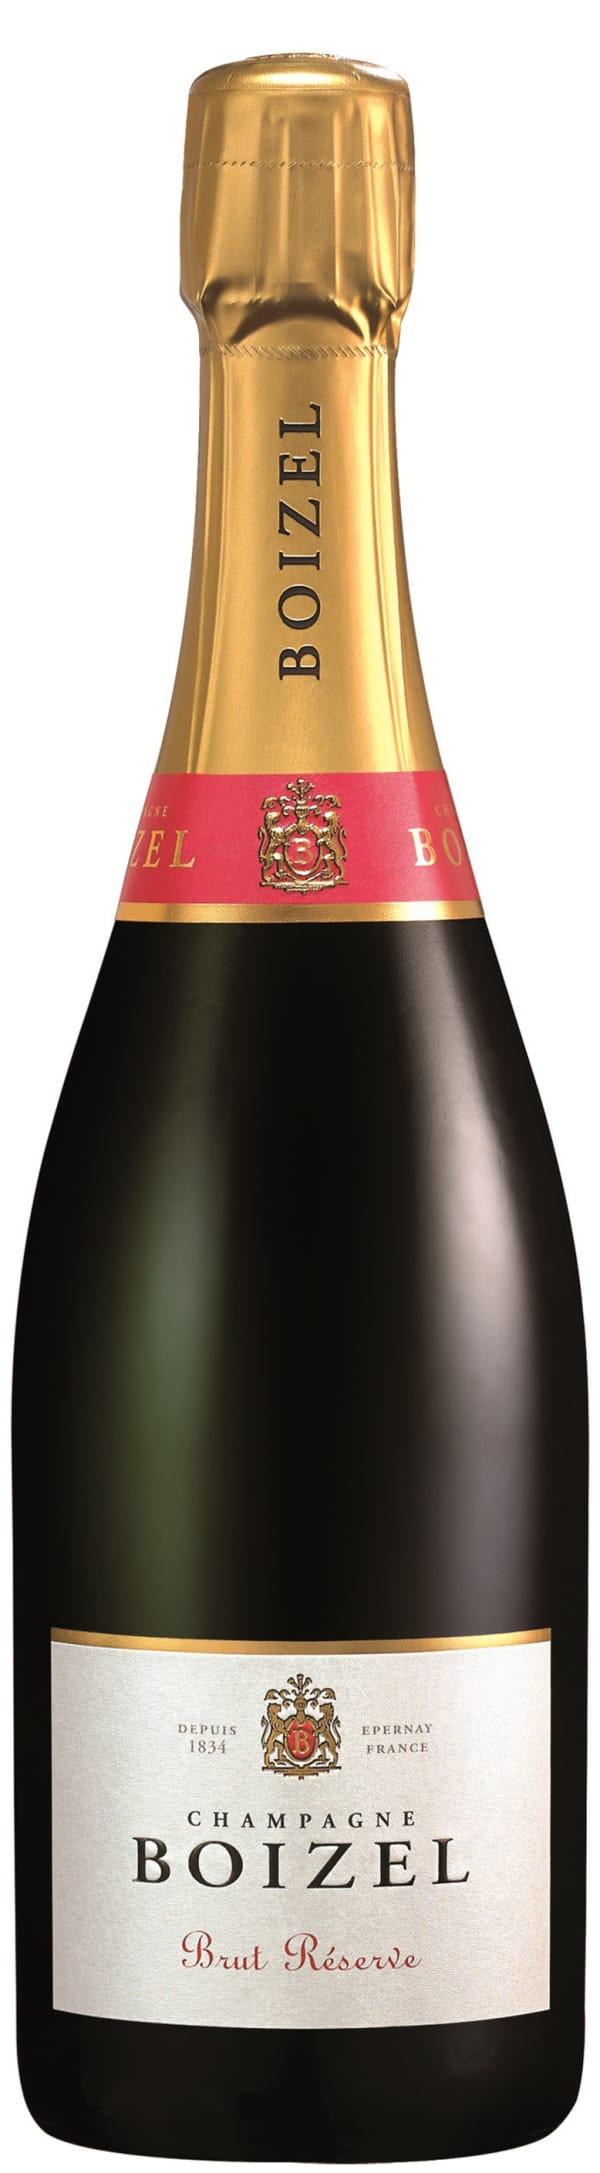 Boizel Reserve Champagne Brut